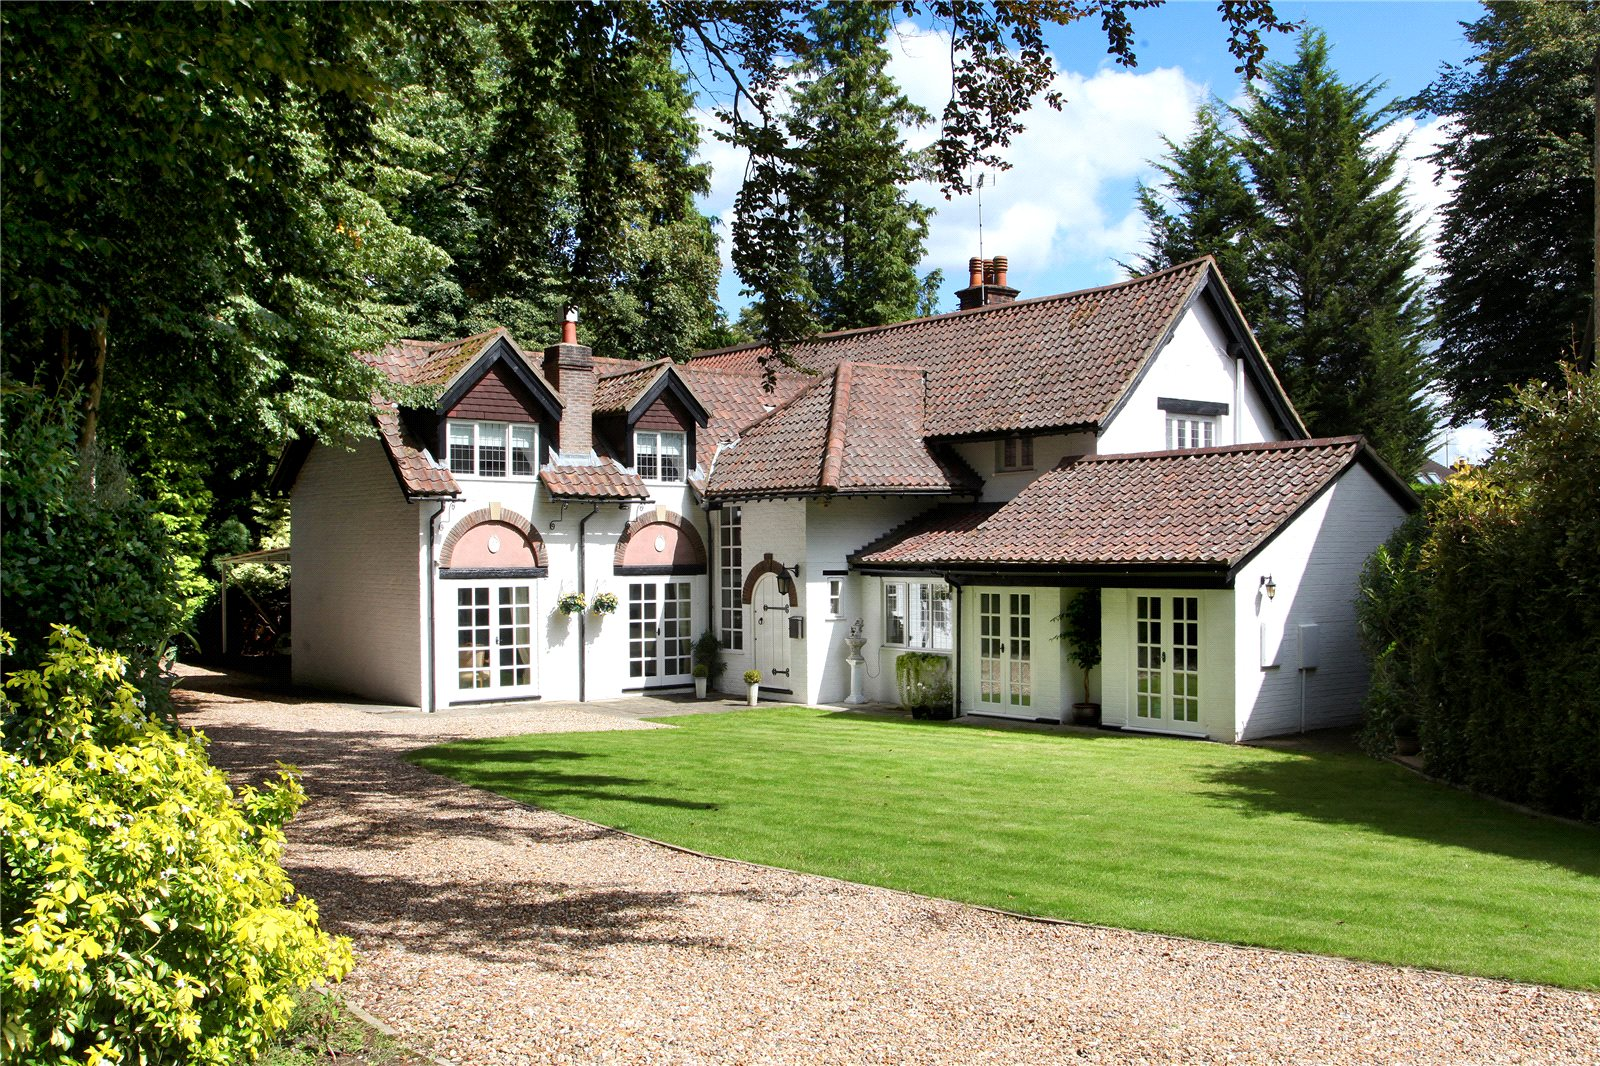 Villa per Vendita alle ore Grant Walk, Sunningdale, Ascot, Berkshire, SL5 Ascot, Inghilterra